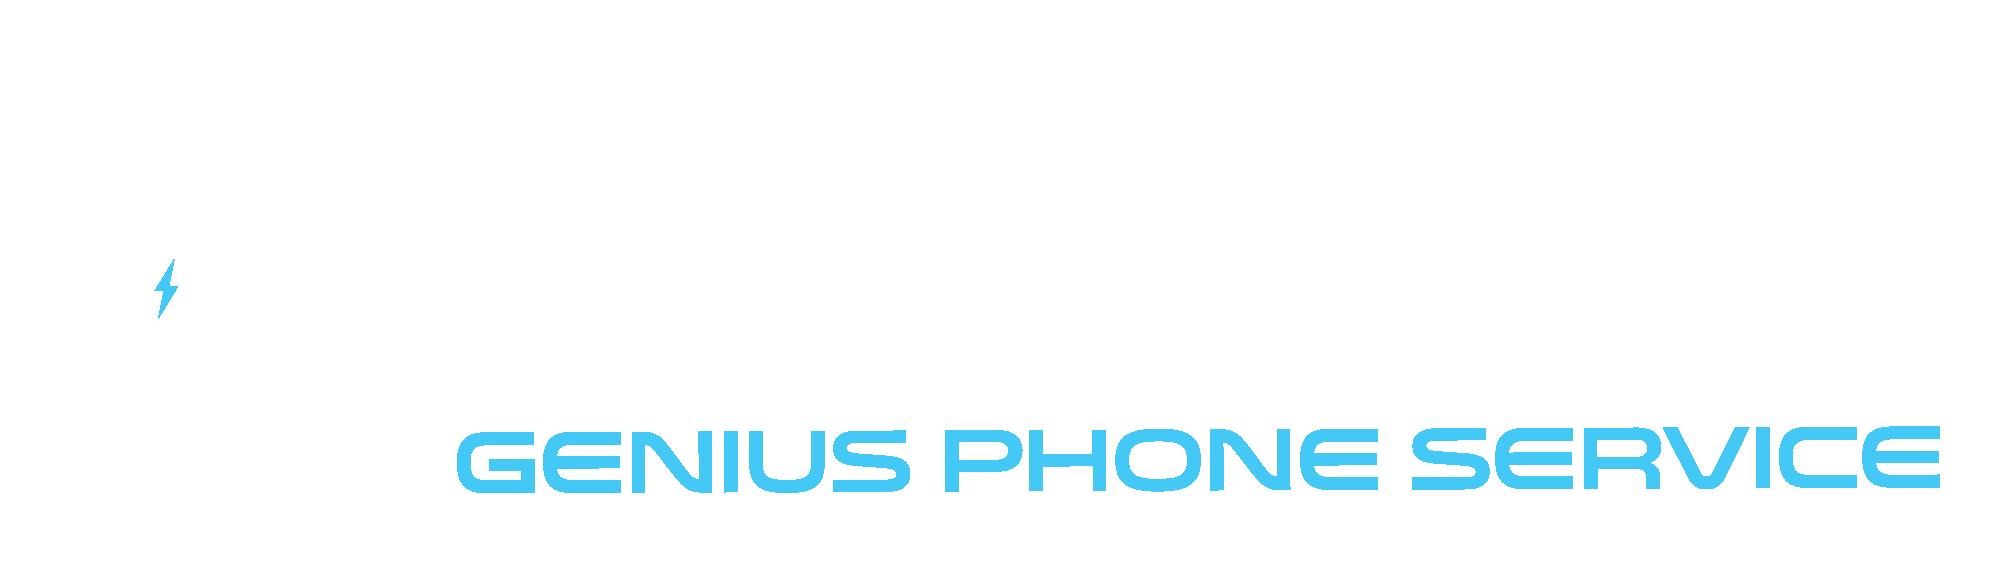 GPS Genius Phone Service